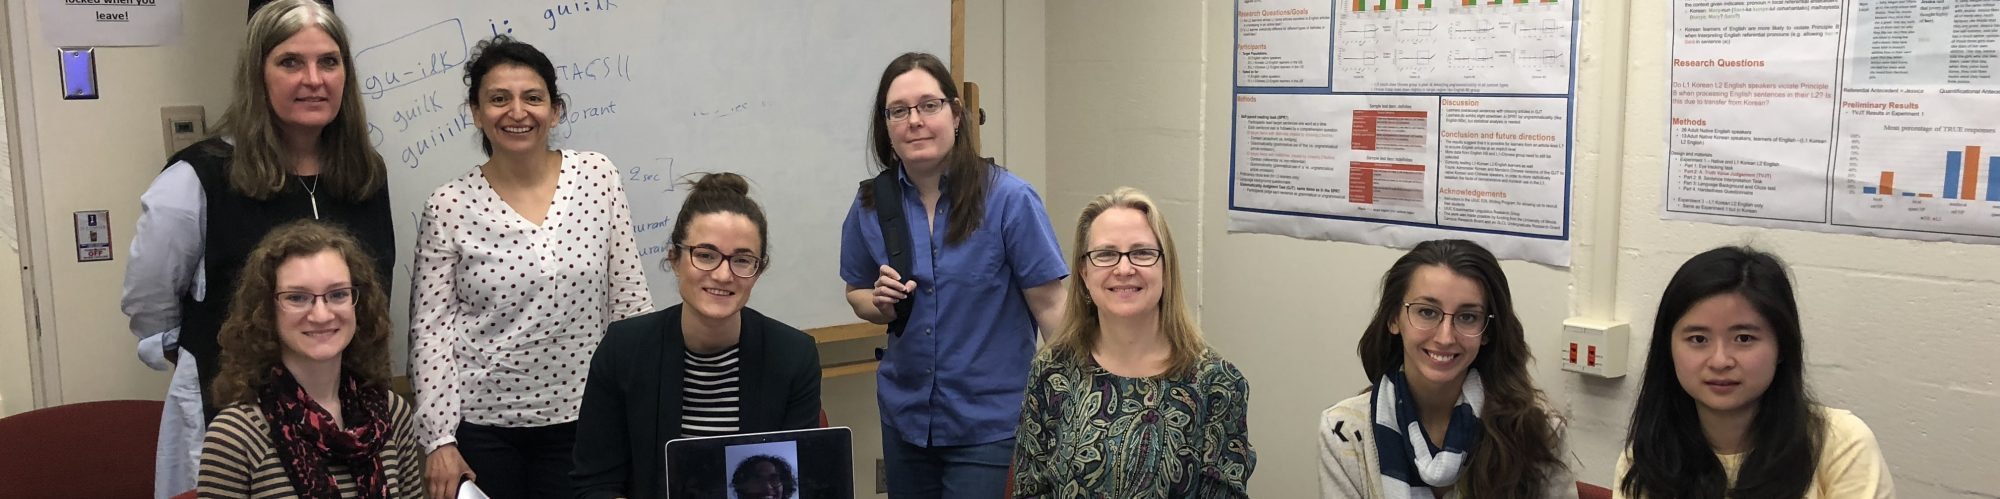 Second Language Acquisition and Bilingualism (SLAB) Lab